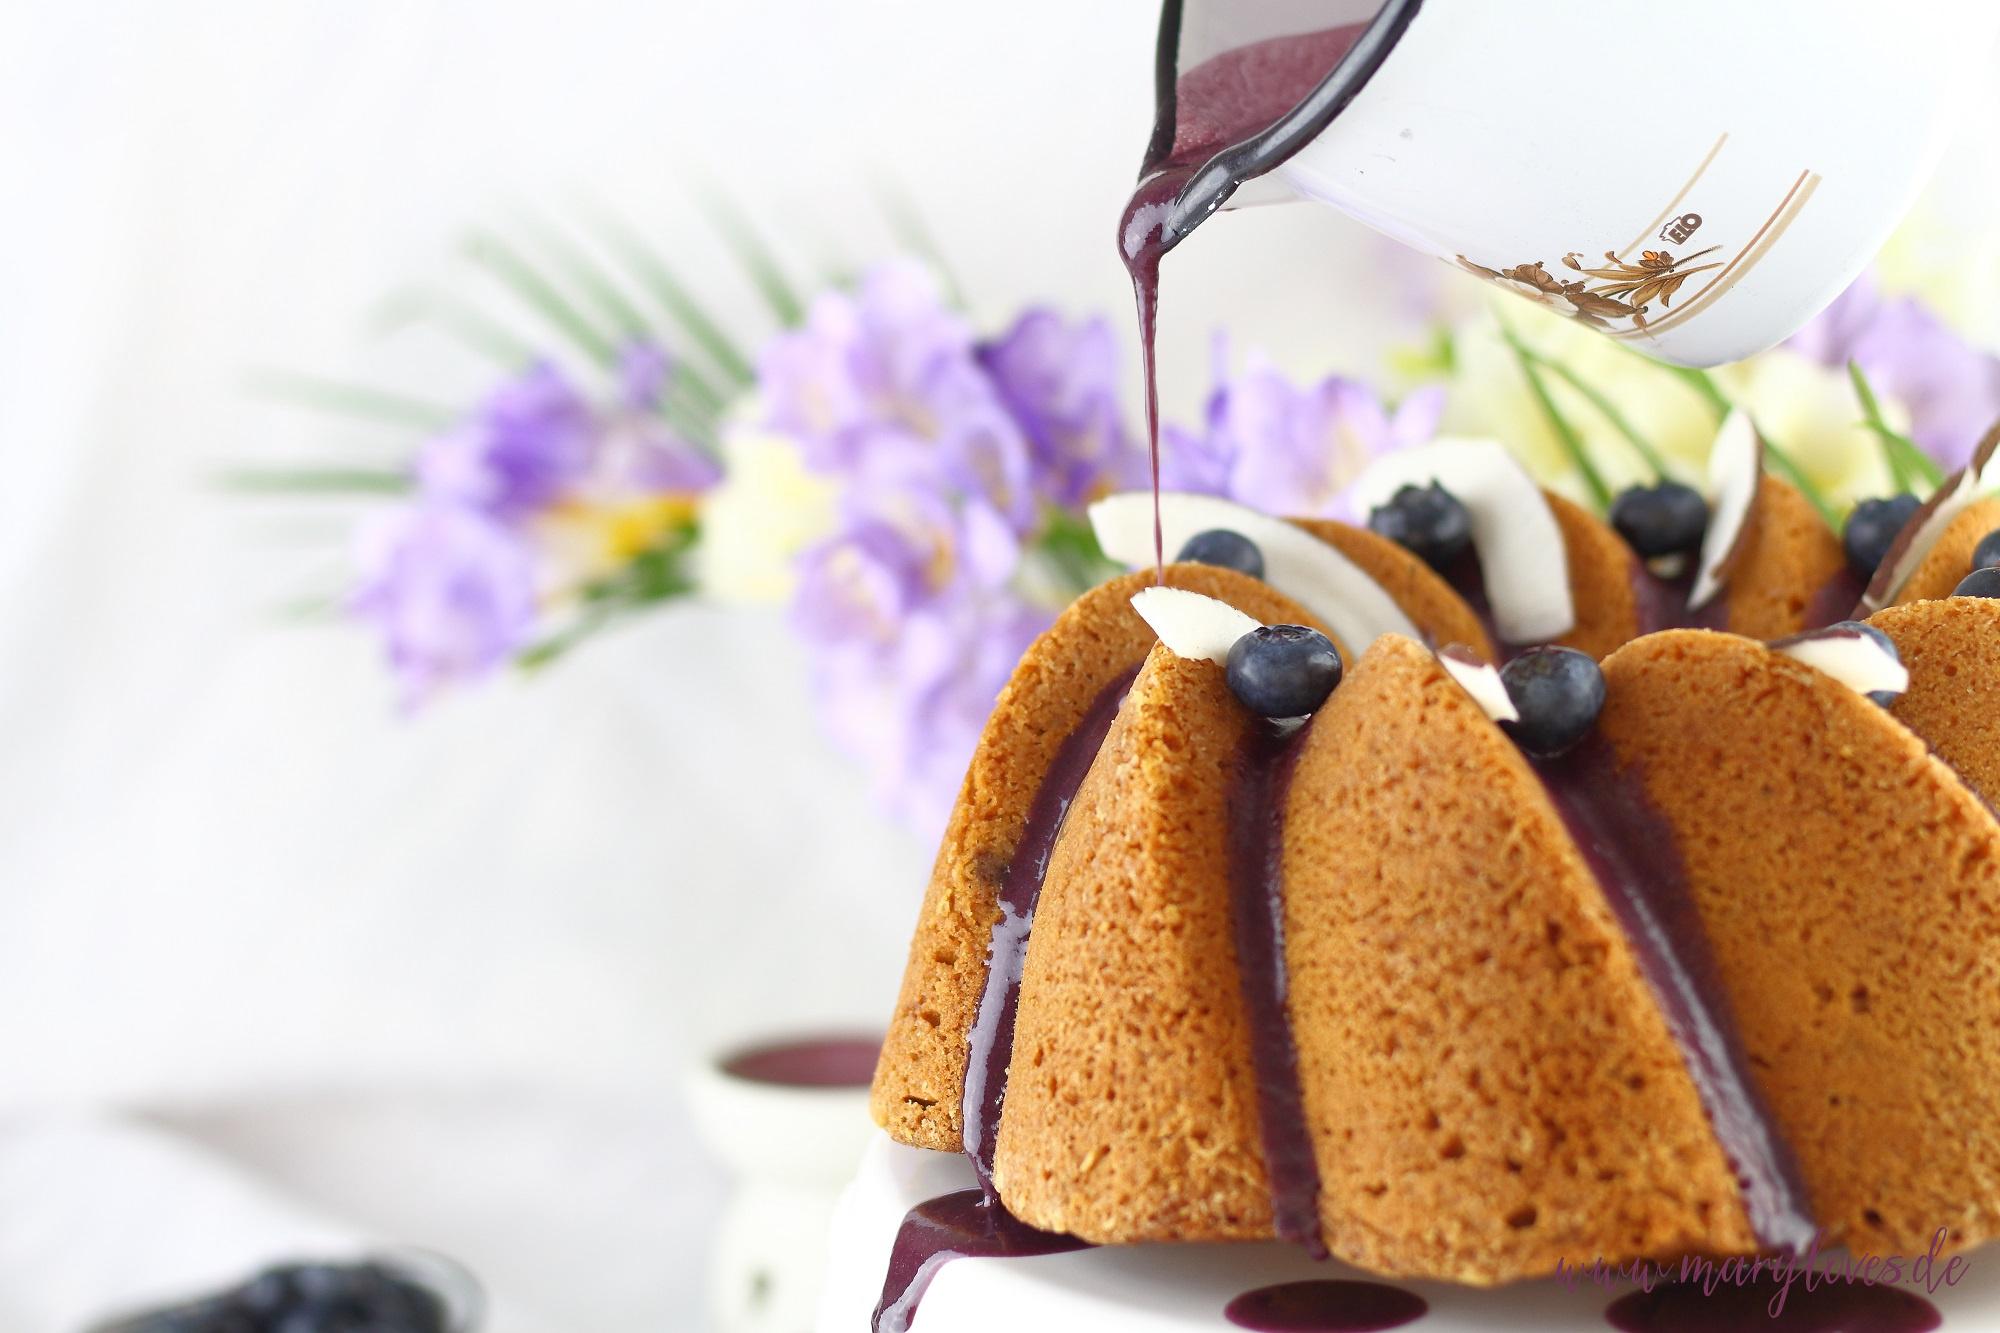 Kokos-Heidelbeer-Gugelhupf mit frischen Beeren & karamelliger Kokosnote